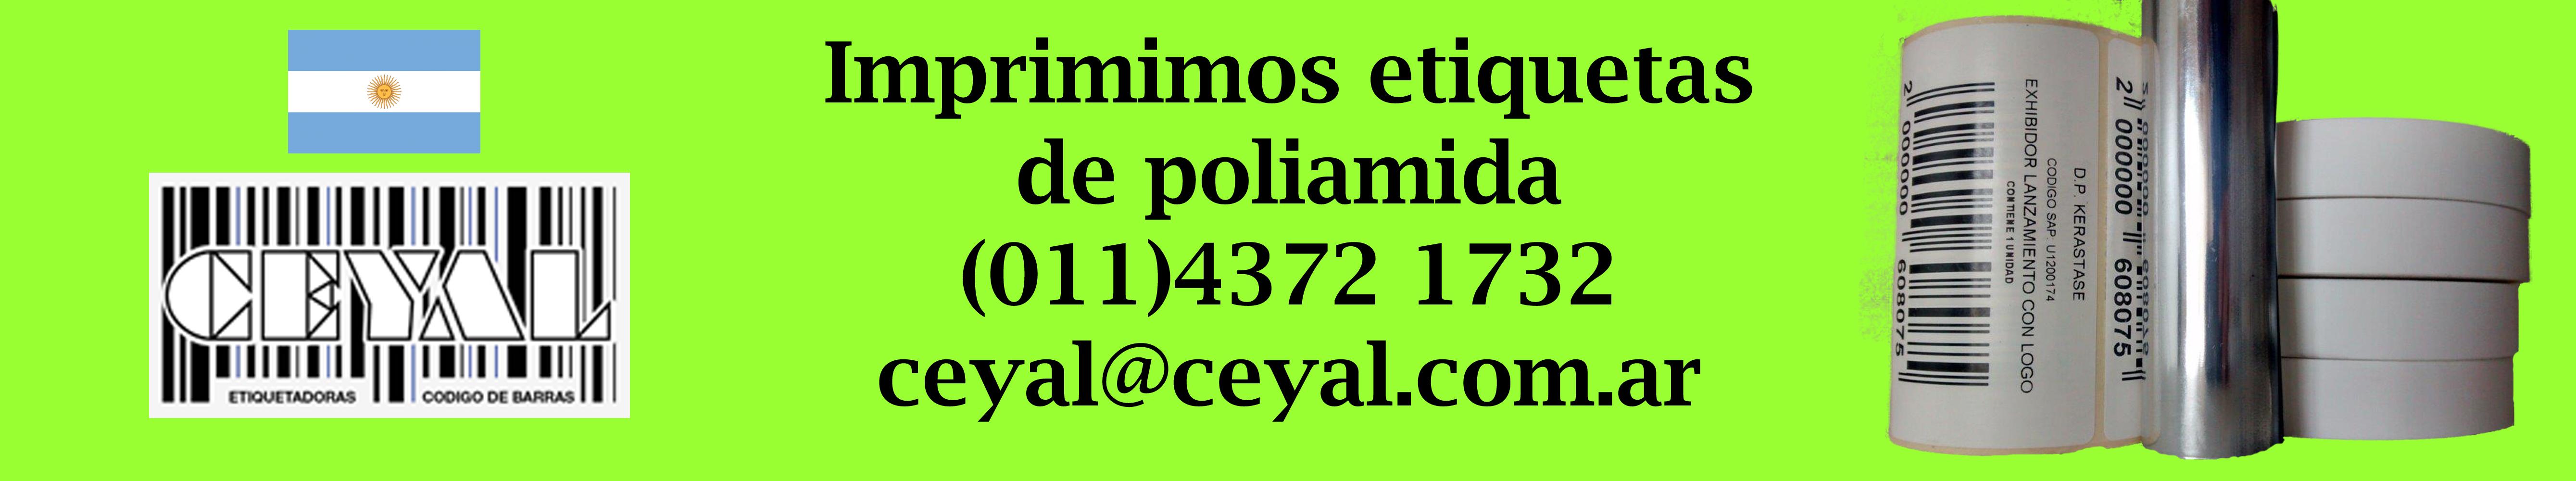 imprimimos etiquetas de poliamida